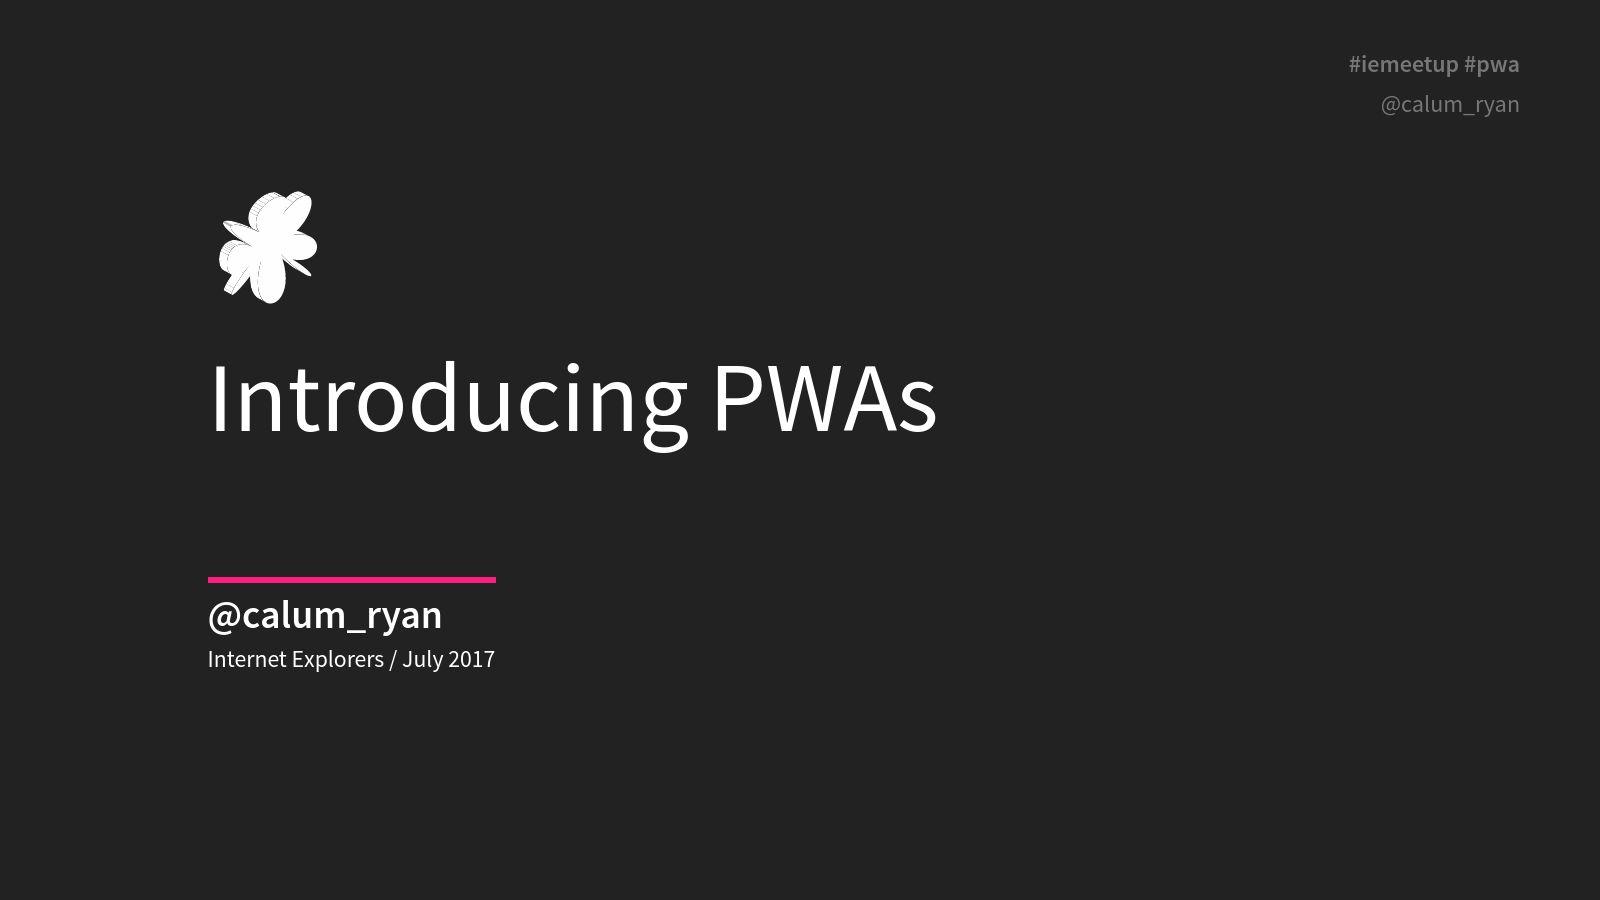 Introducing PWAs